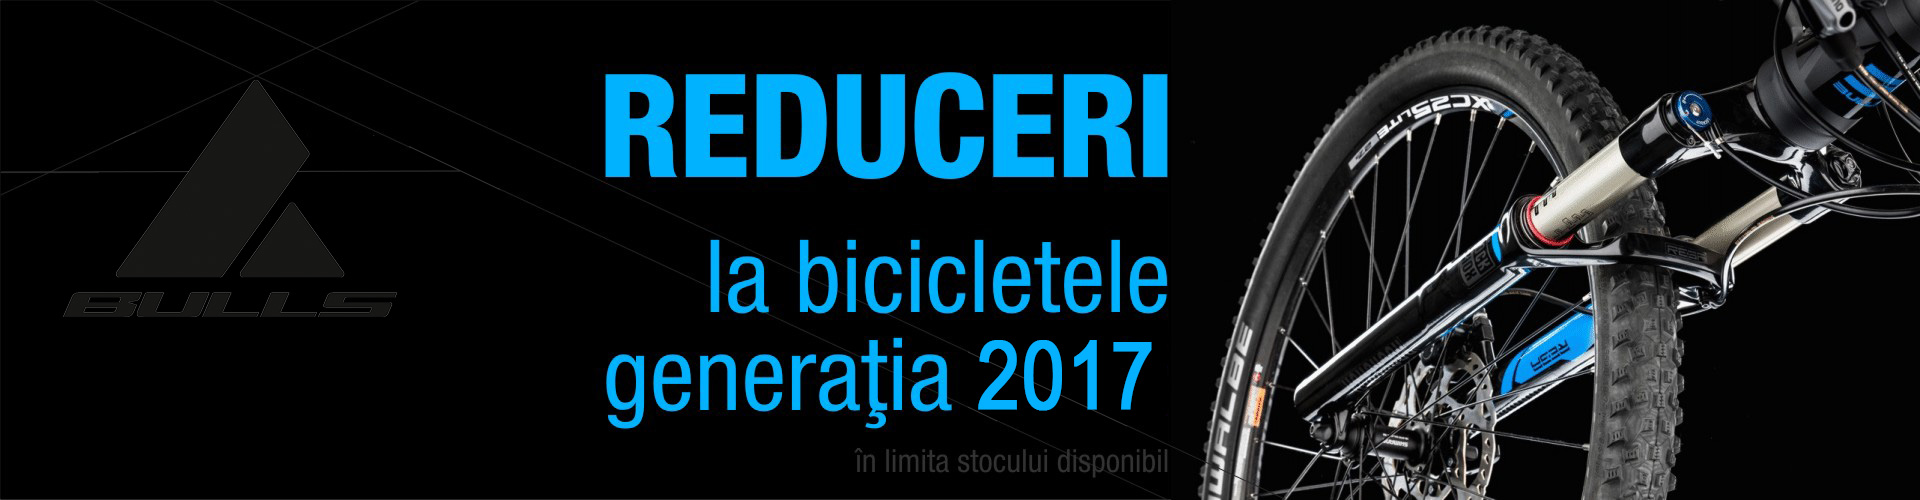 Generatia 2017